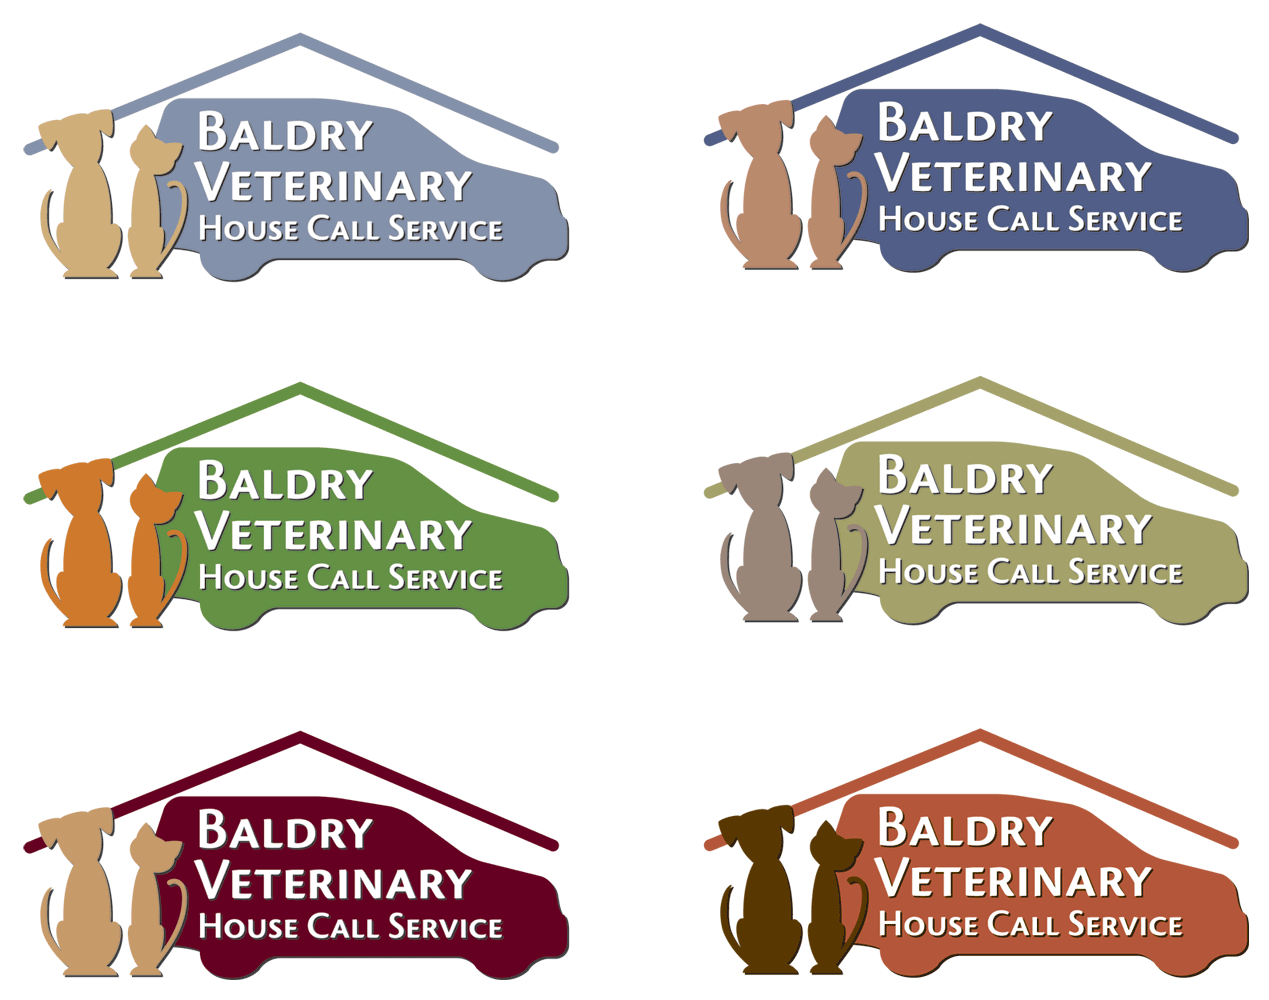 Logo Design by 4cCameron - Entry No. 126 in the Logo Design Contest Captivating Logo Design for Baldry Veterinary House Call Service.